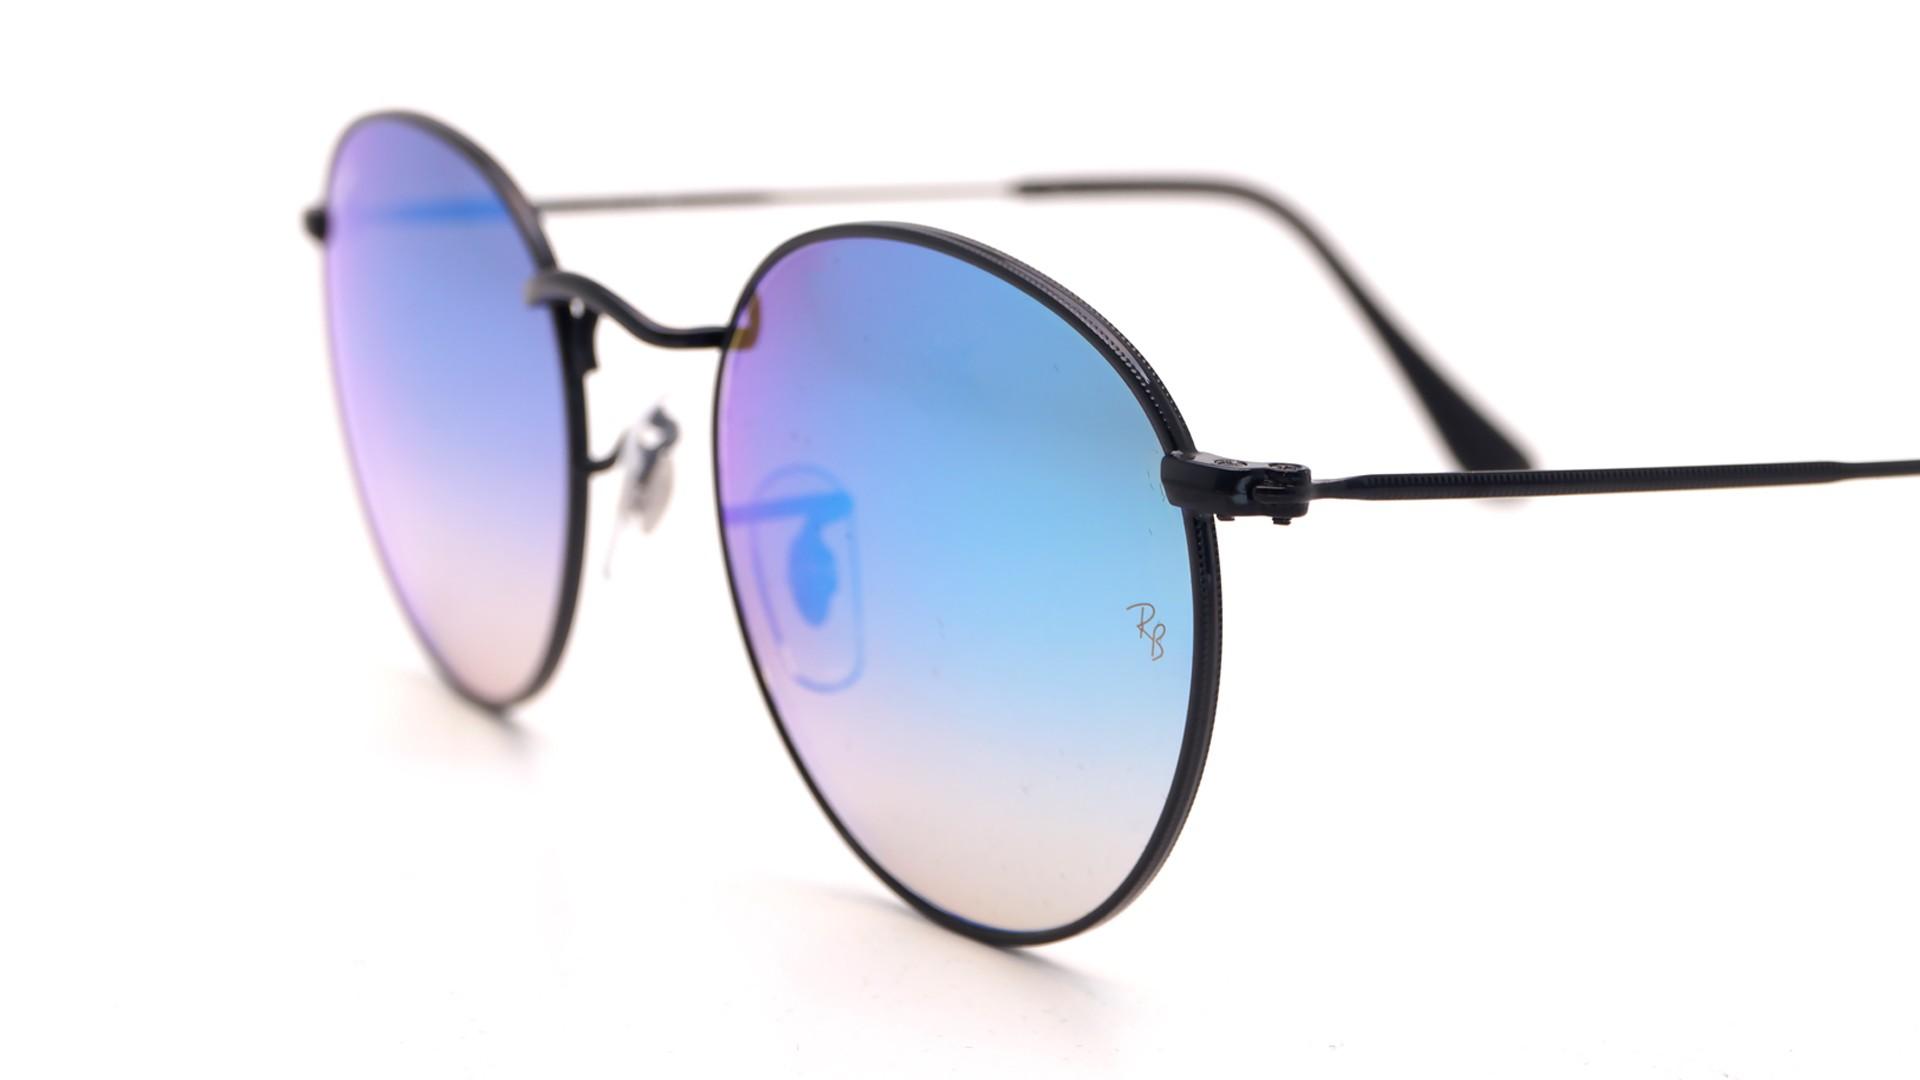 bd40cbb24 Sunglasses Ray-Ban Round Metal Black RB3447 002/4O 50-21 Medium Gradient  Mirror